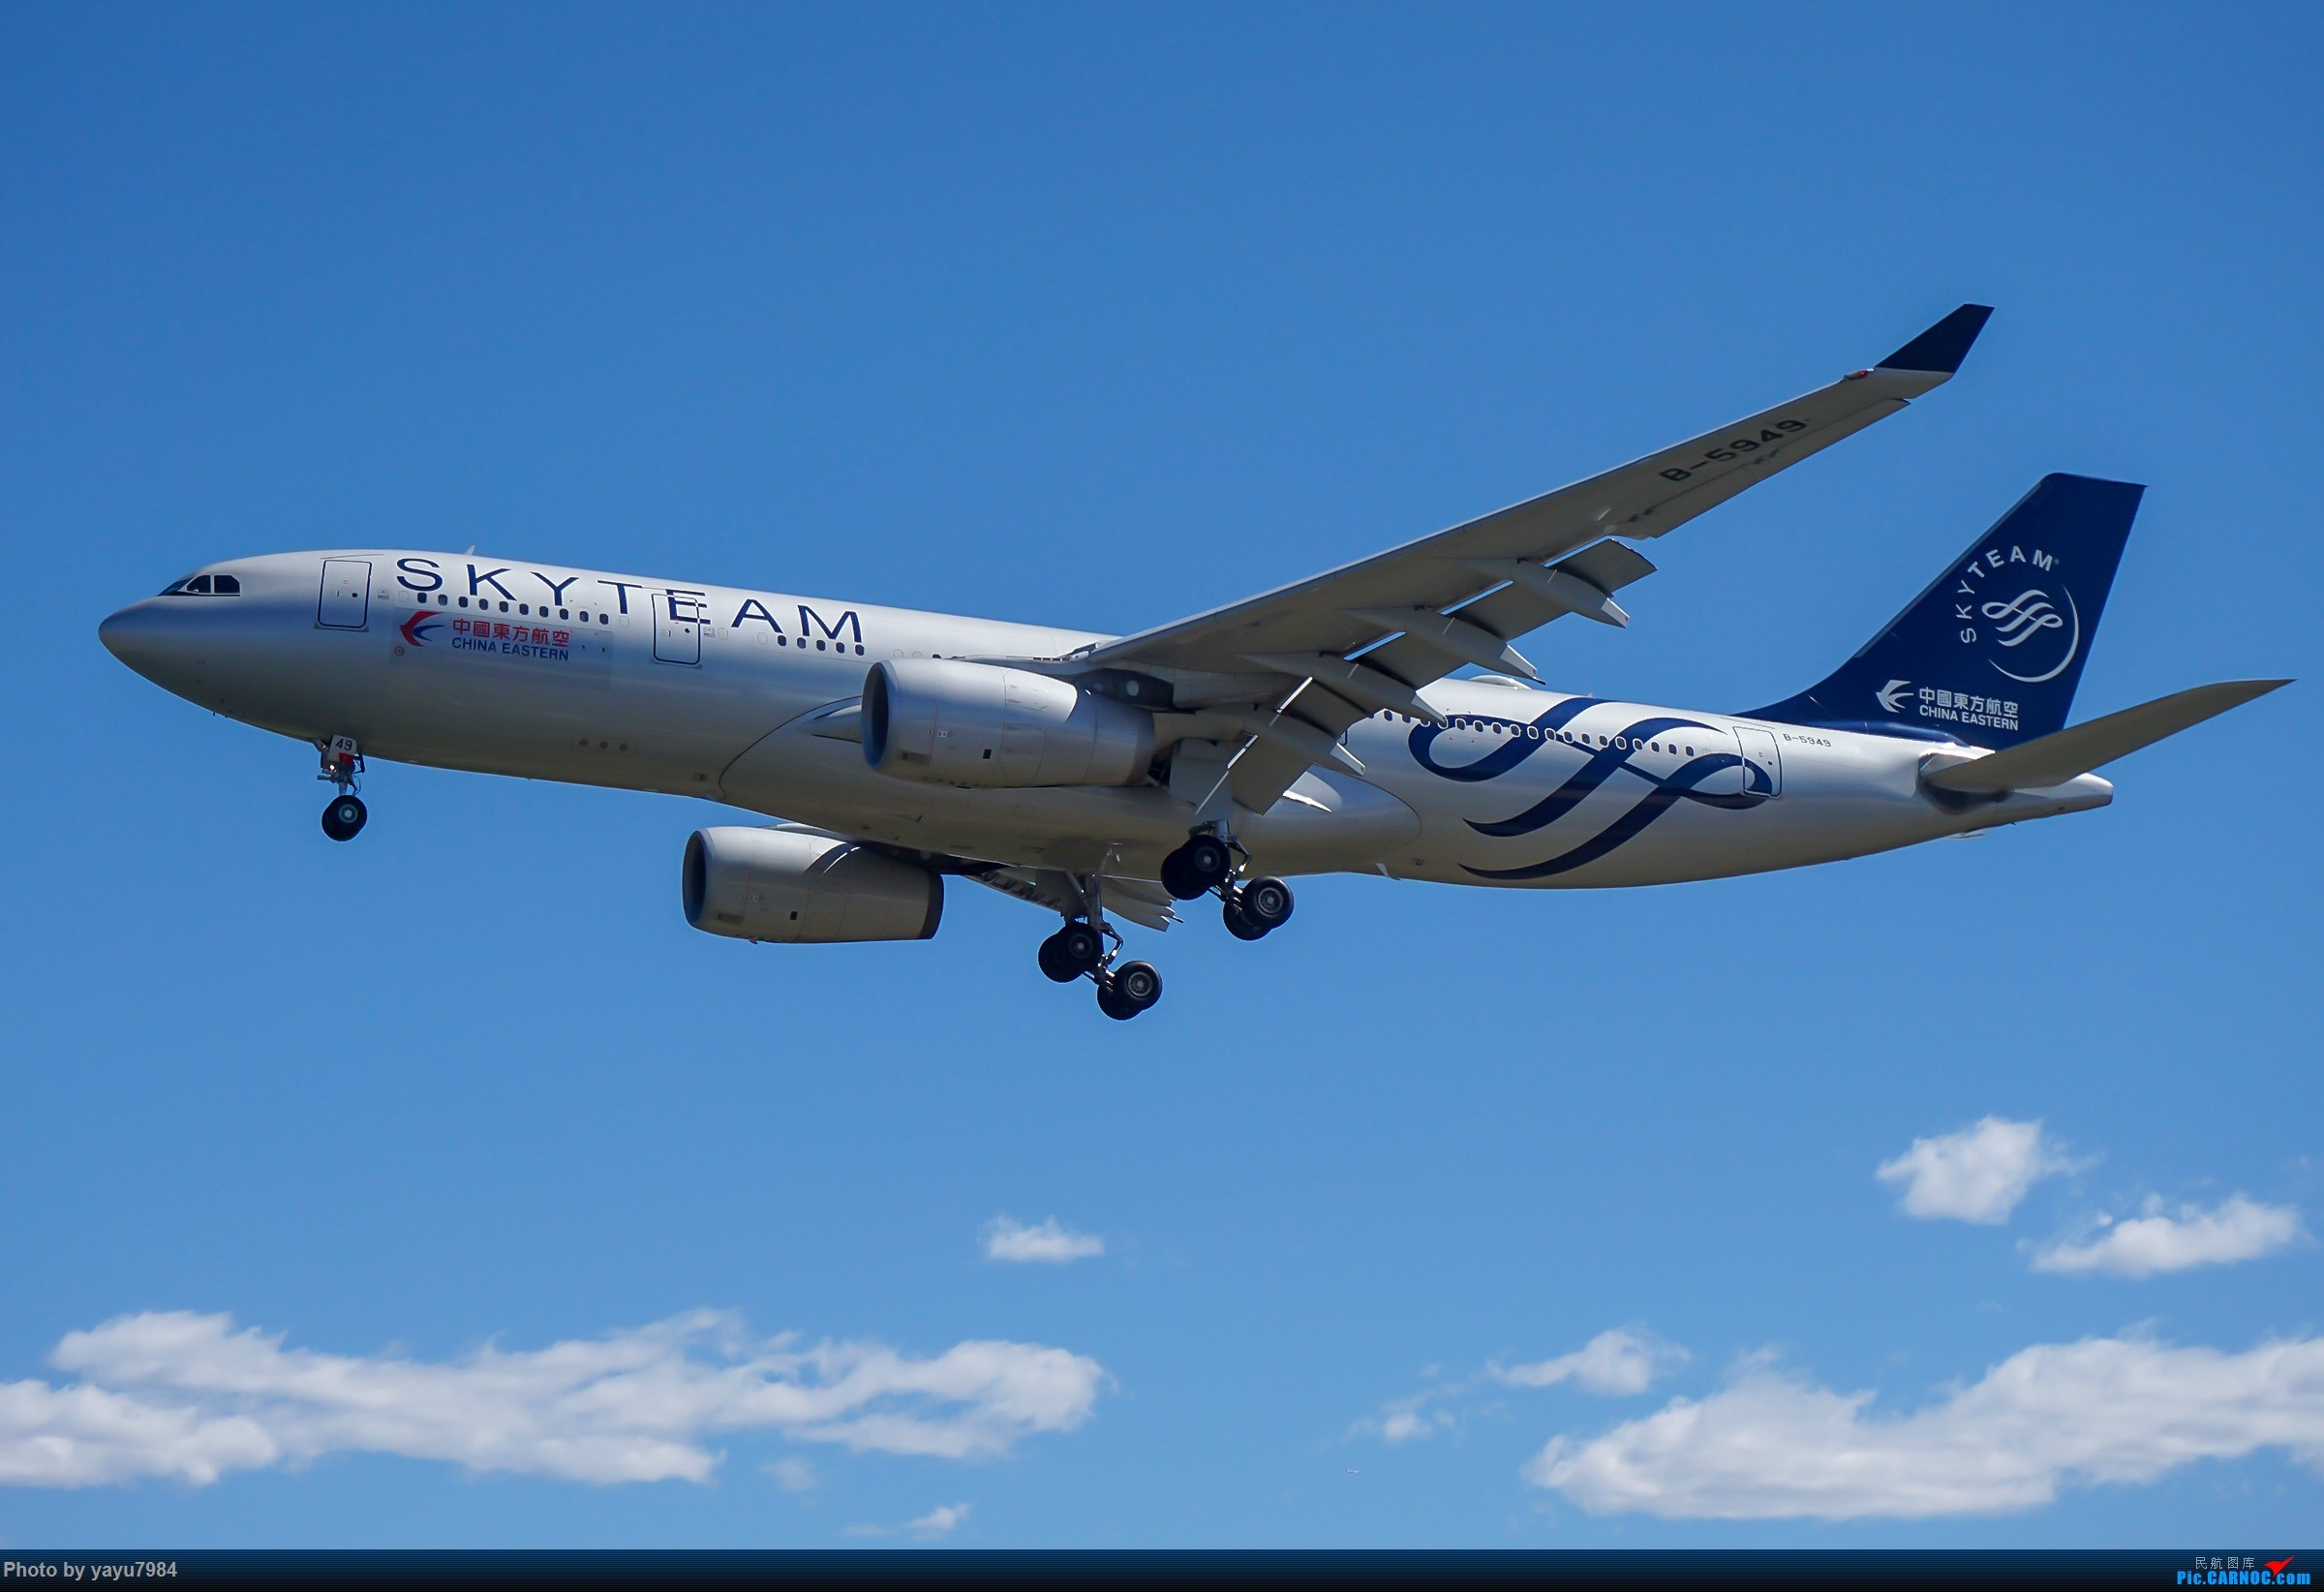 Re:[原创][SYD] 东航天合332,雪绒花343,华航蓝鹊,以及其他日常货 AIRBUS A330-200 B-5949 澳大利亚悉尼金斯福德·史密斯机场